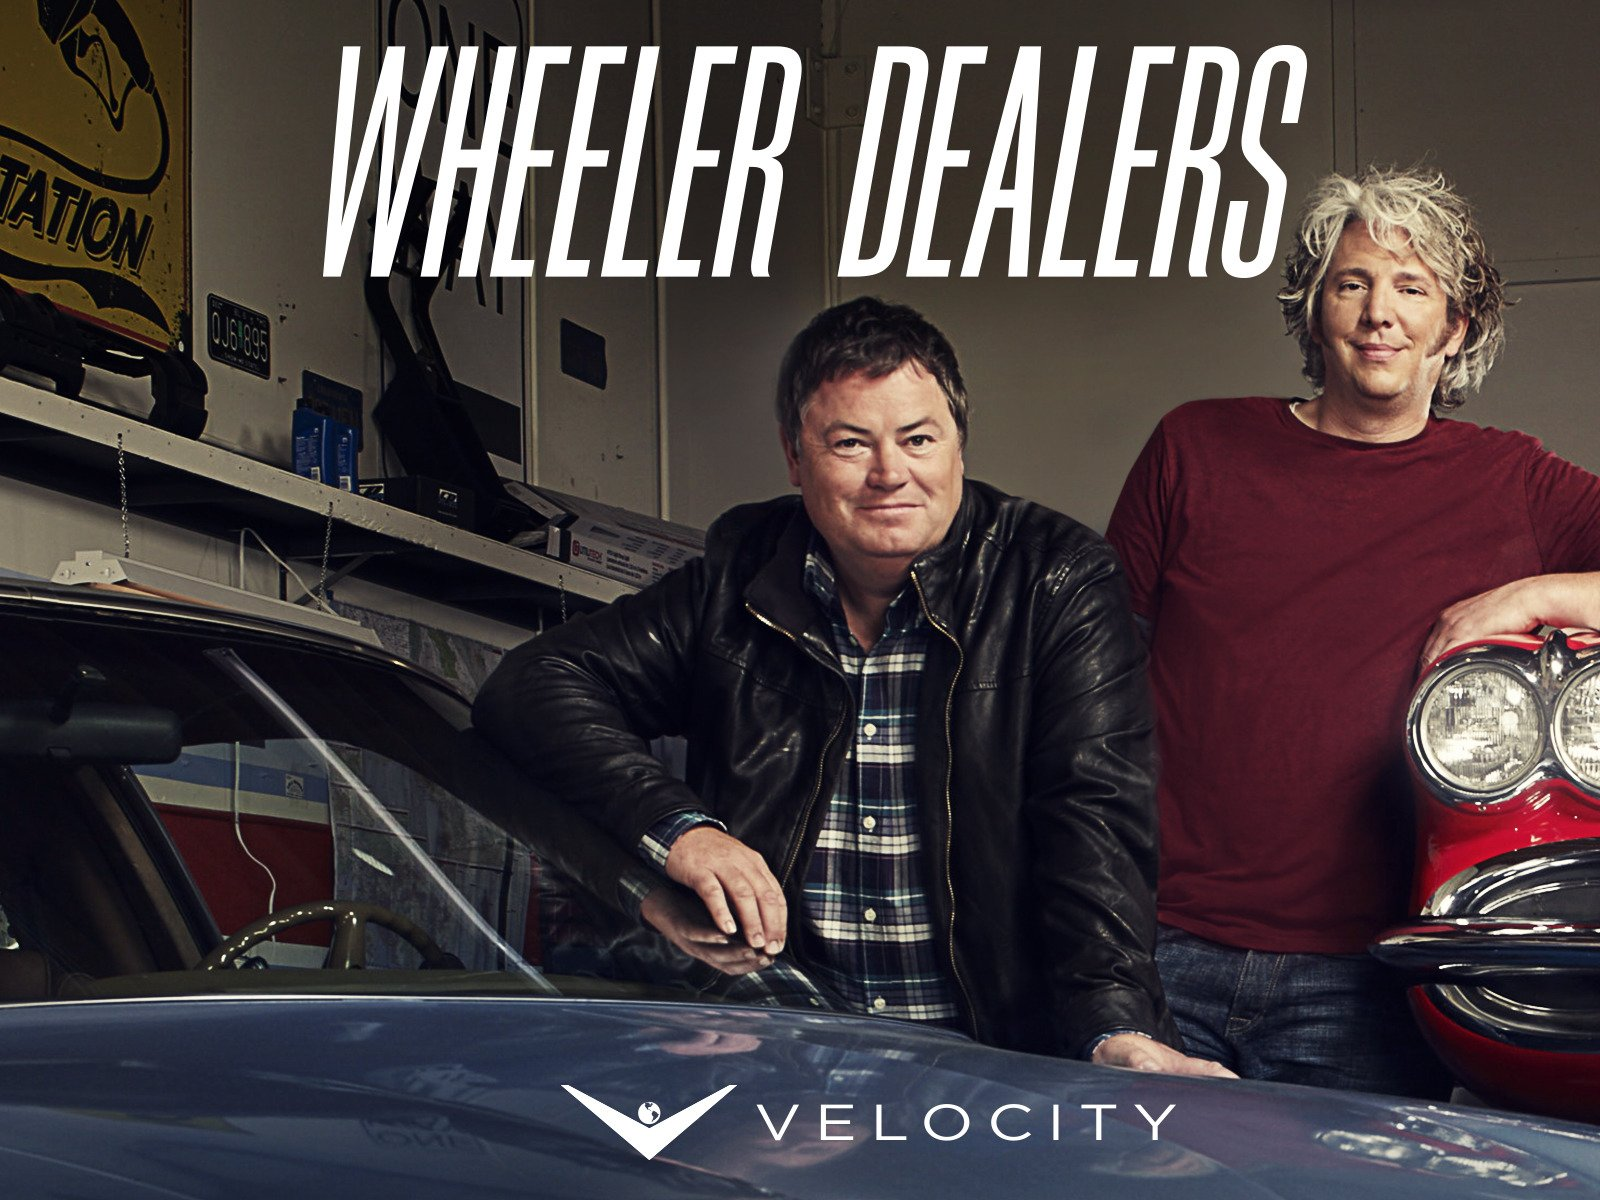 wheeler dealers season 11 episode 2